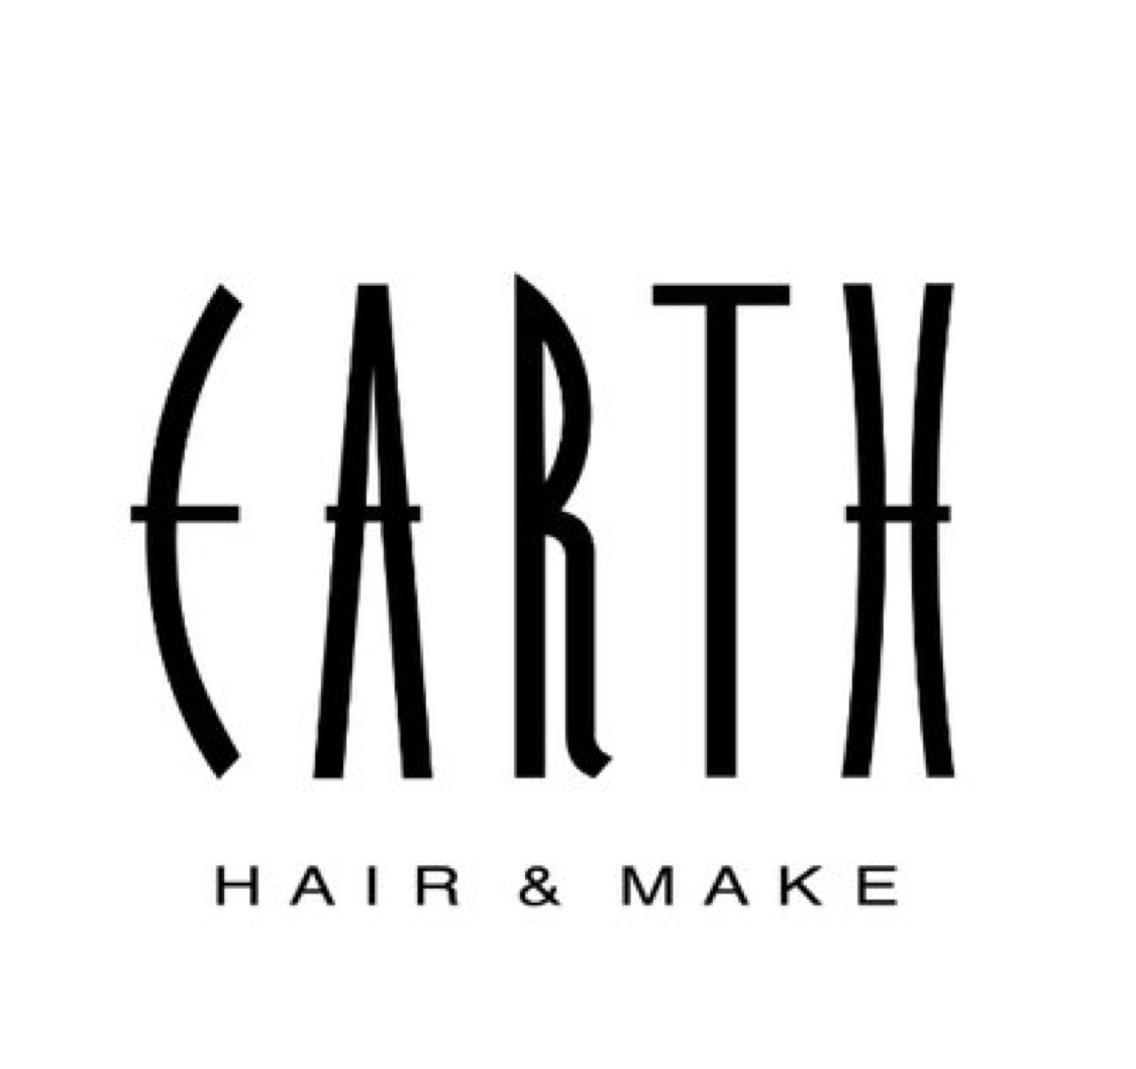 EARTH綱島店所属・NAOKI NAKAYAMの掲載